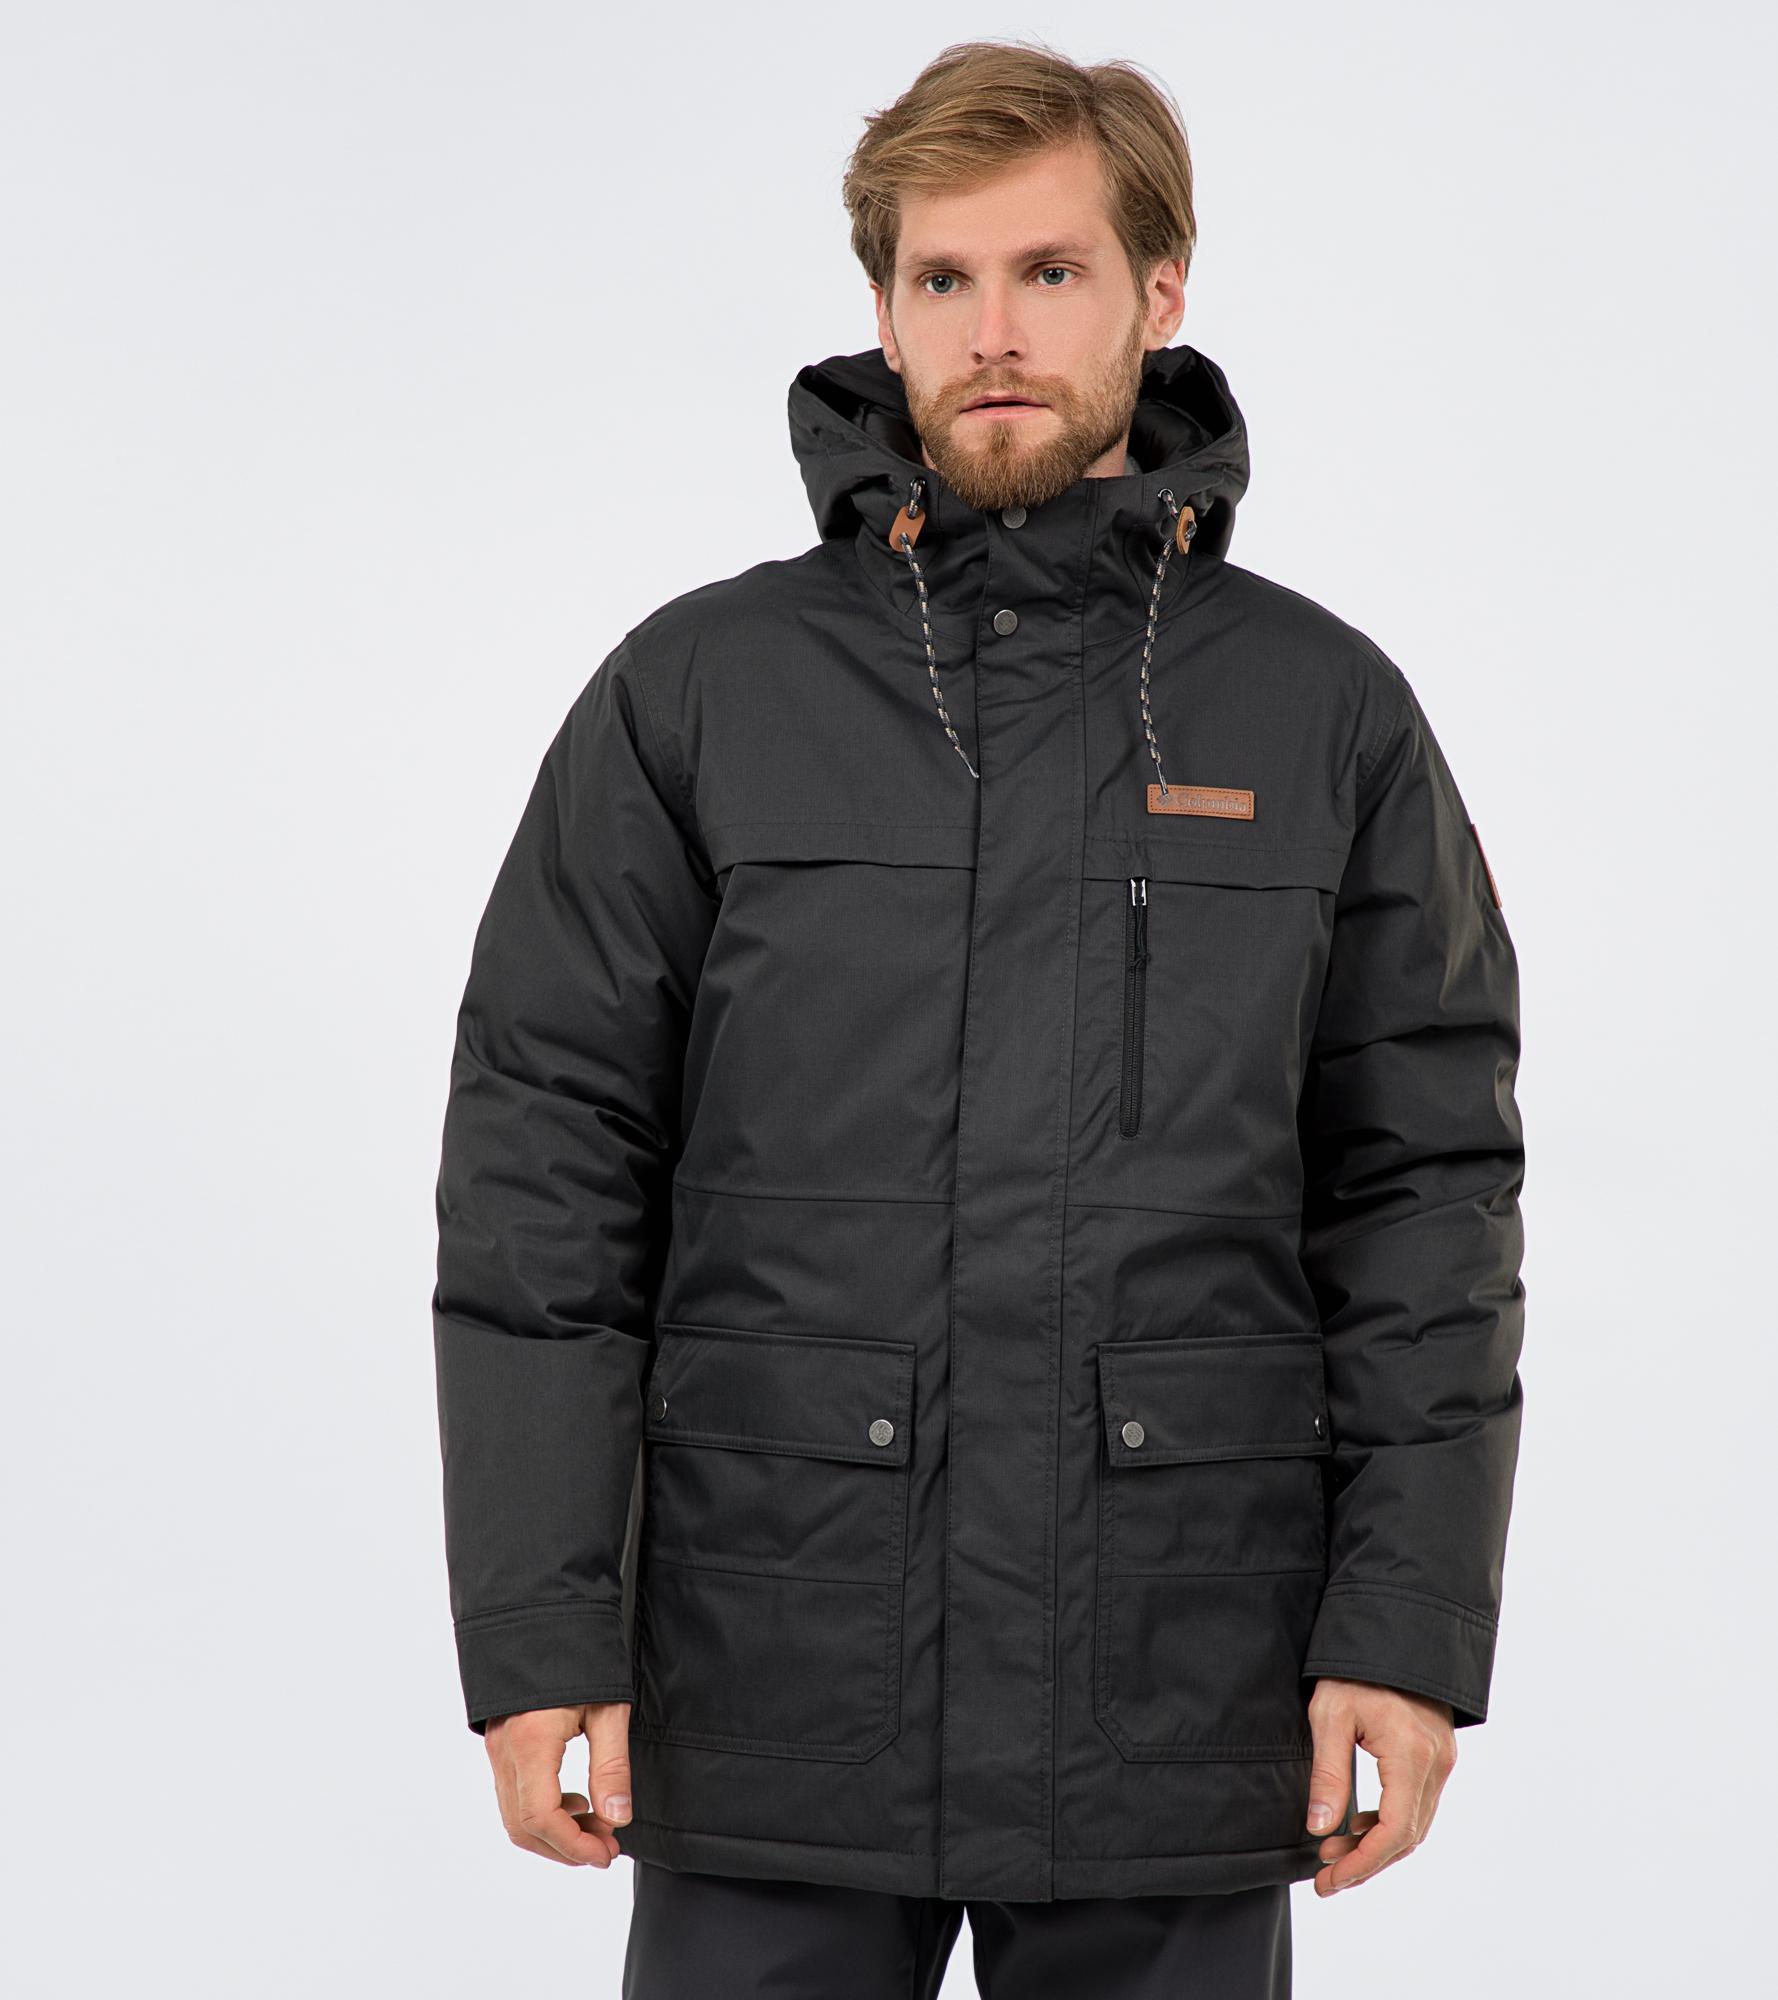 Columbia Куртка утепленная мужская Columbia Norton Bay, размер 56-58 цены